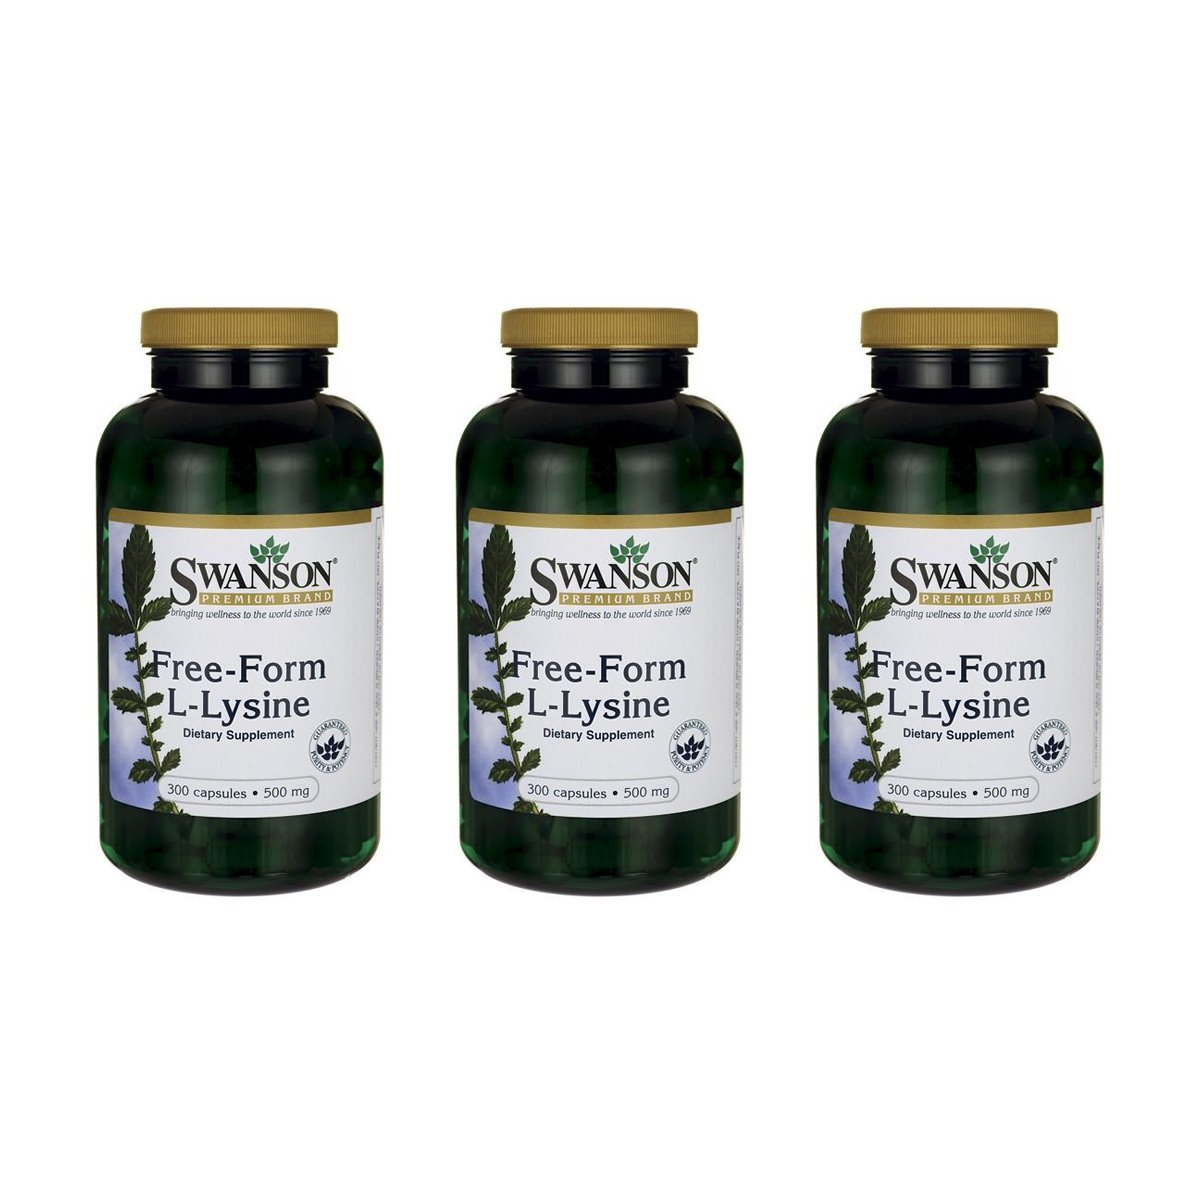 Swanson Free-Form L-Lysine 500 mg 300 Caps 3 Pack